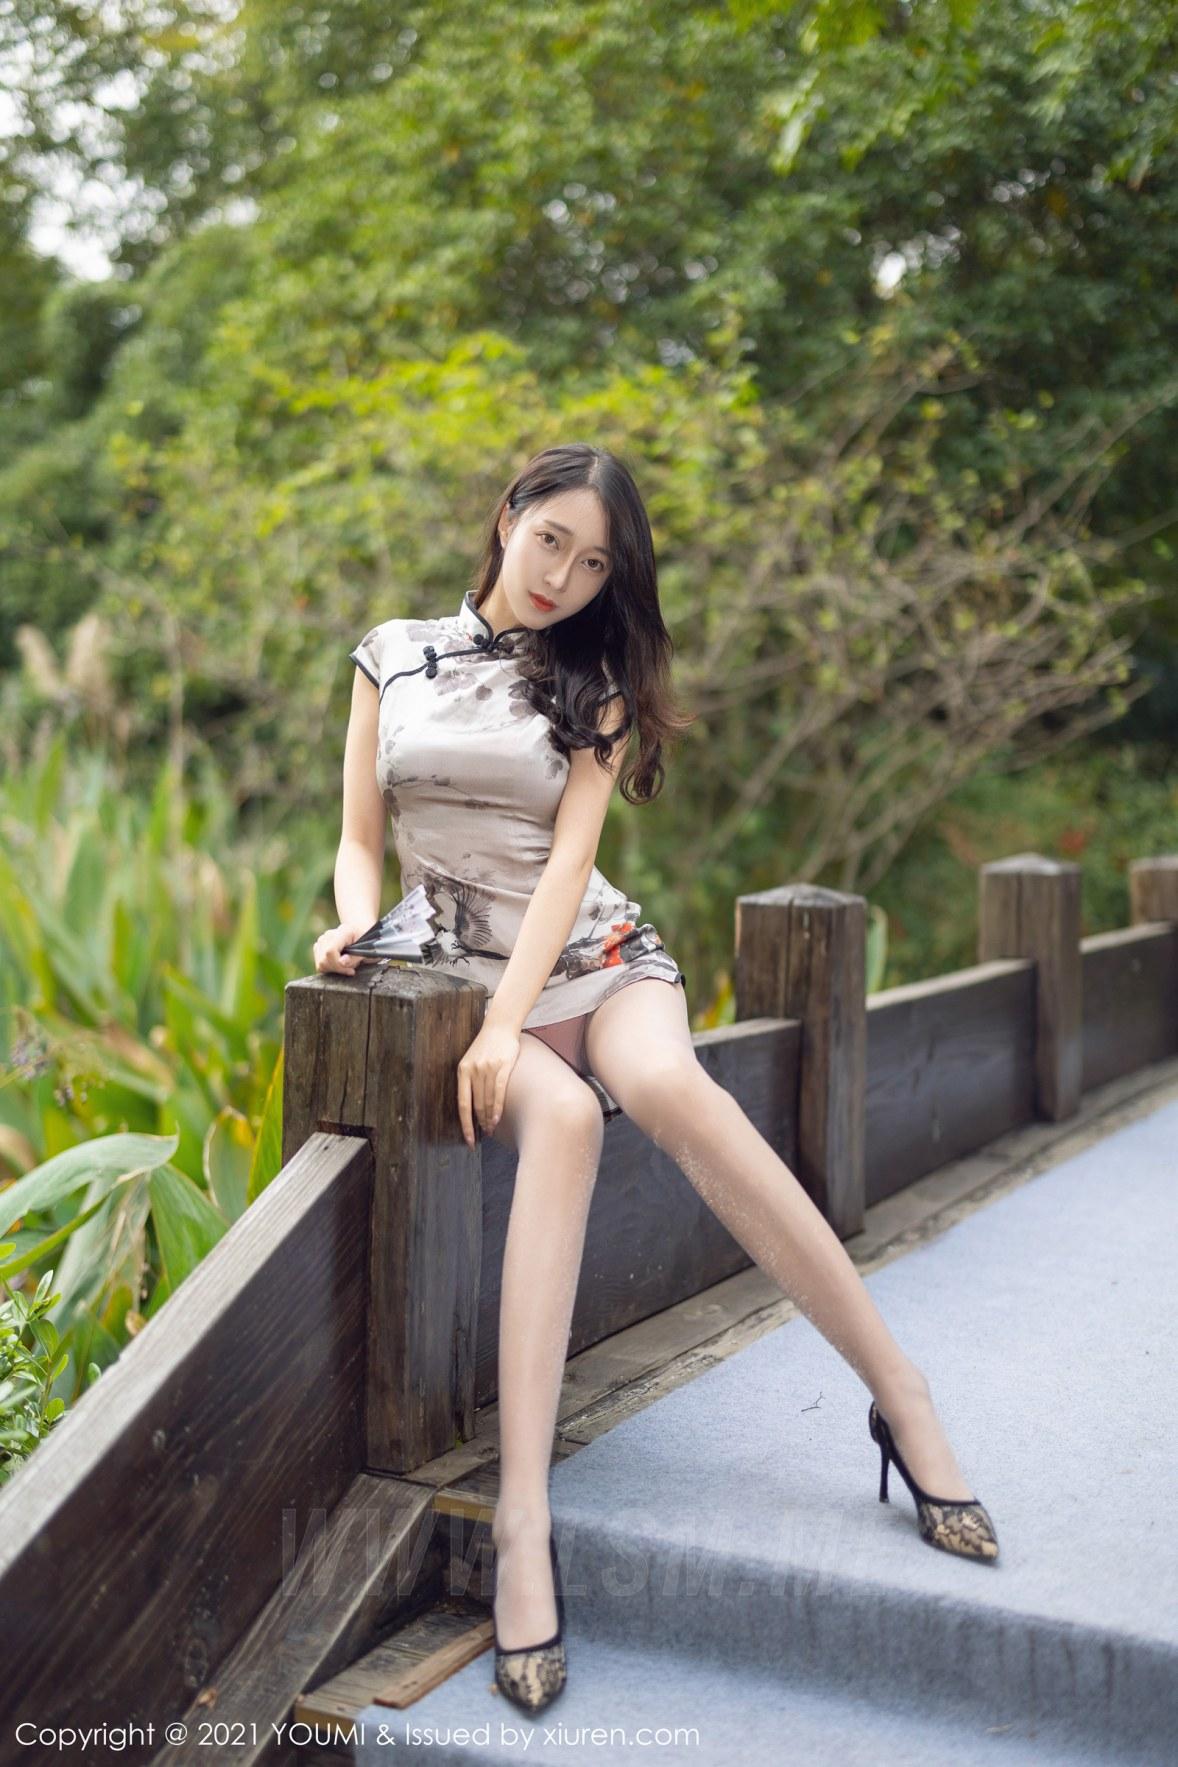 635 033 x6p 3600 5400 - YOUMI 尤蜜荟 Vol.635  浪漫旗袍 玥儿玥er - 尤蜜荟 -【免费在线写真】【丽人丝语】